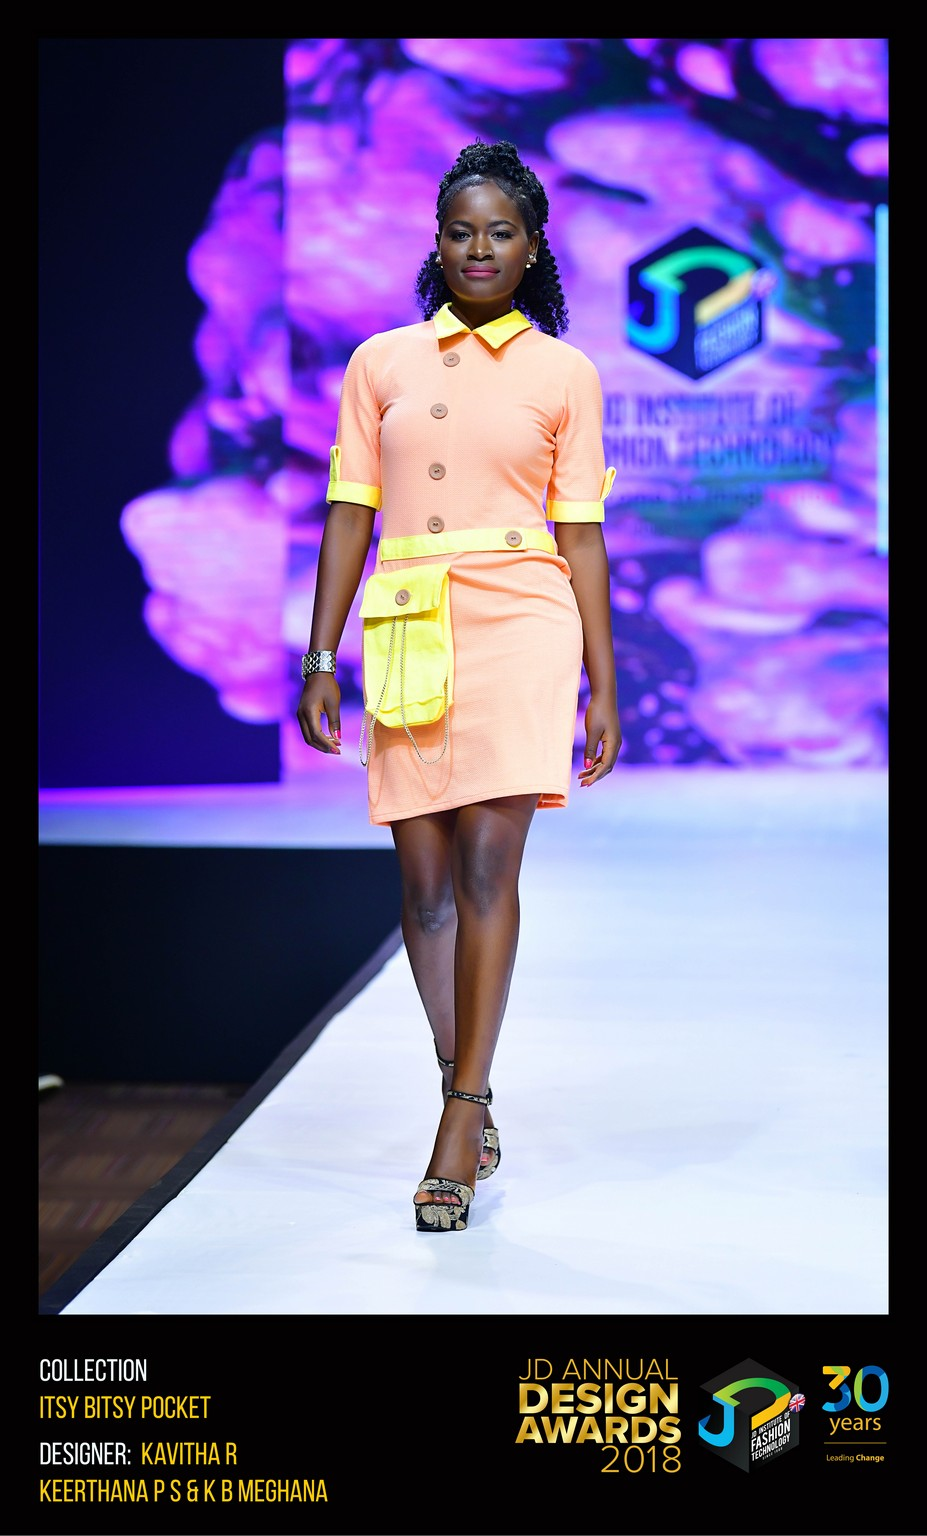 Itsy Bitsy Pocket Dress – Change – JD Annual Design Awards 2018   Designer: Kavitha, Keertana and Meghana   Photography : Jerin Nath (@jerin_nath) itsy bitsy pocket dress Itsy Bitsy Pocket Dress – Change – JD Annual Design Awards 2018 ITSY BITSY POCKET3